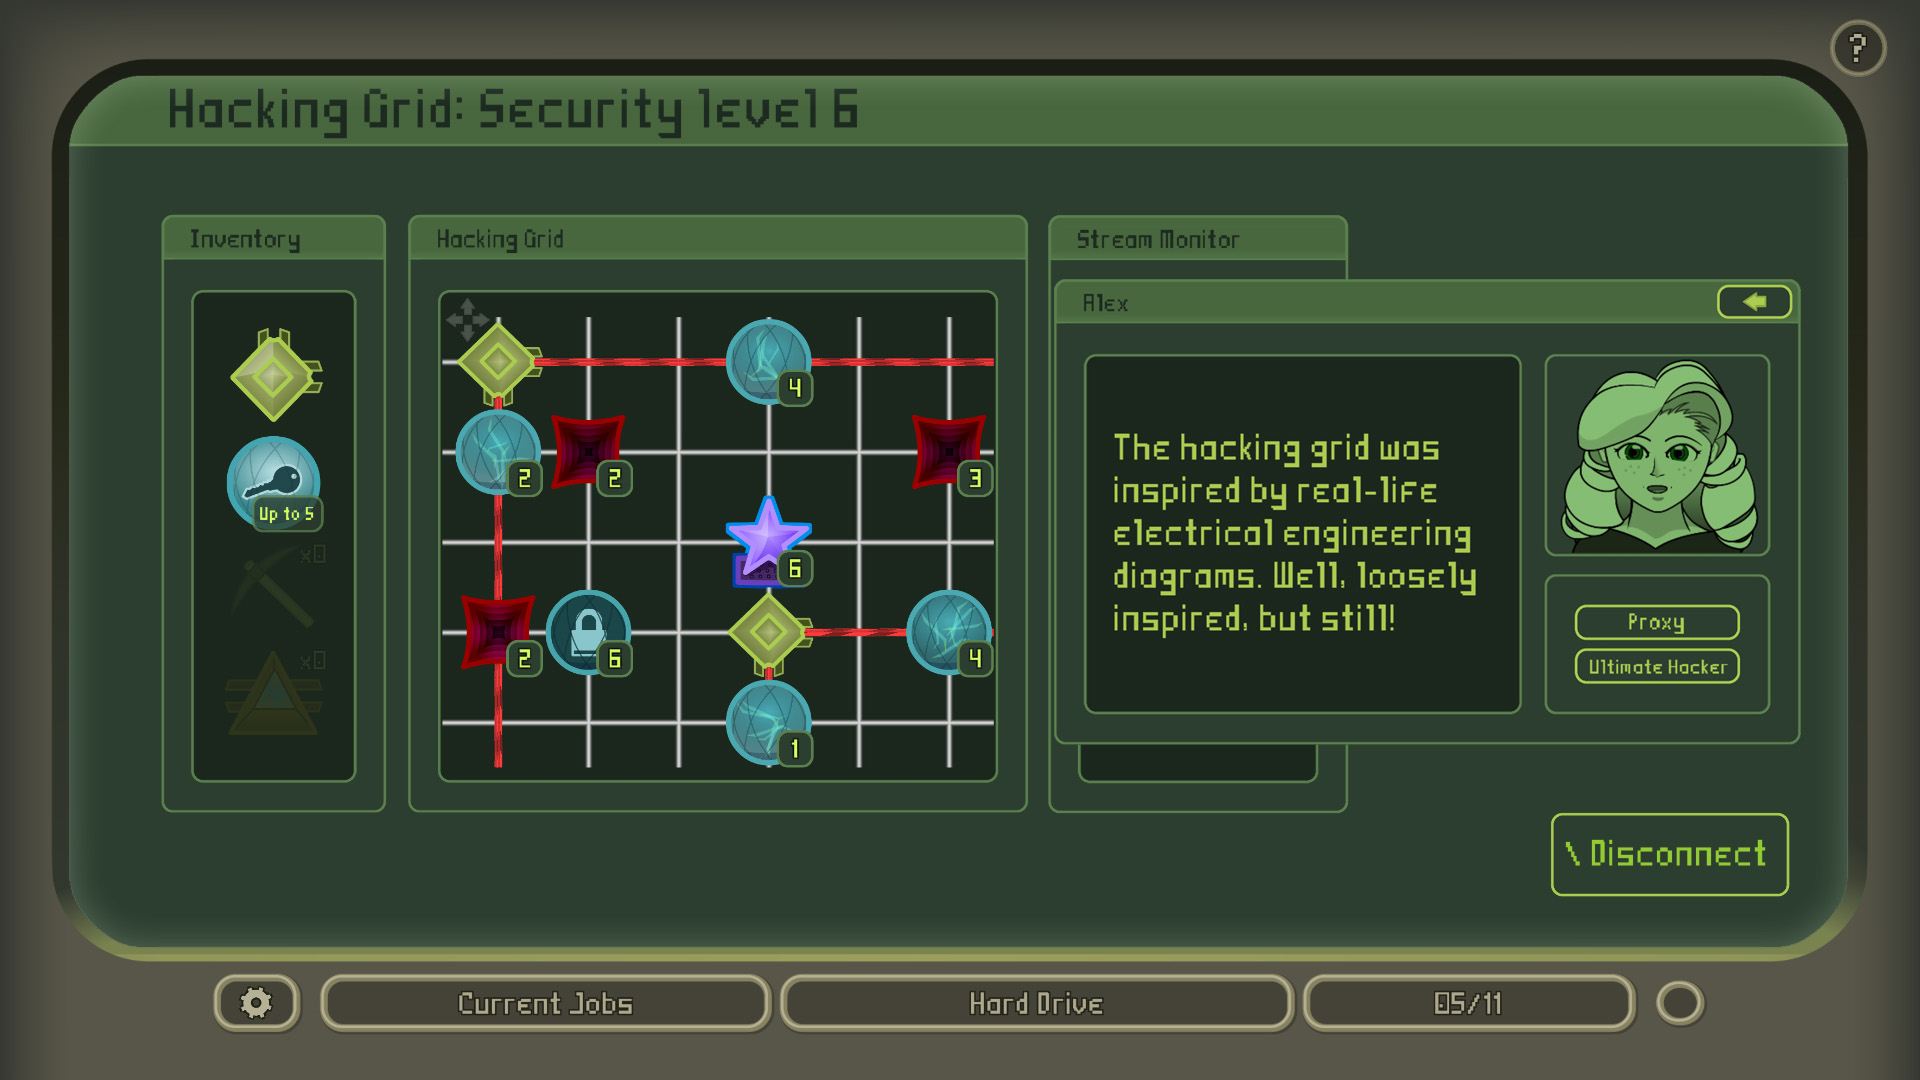 Showcase :: Proxy - Ultimate Hacker